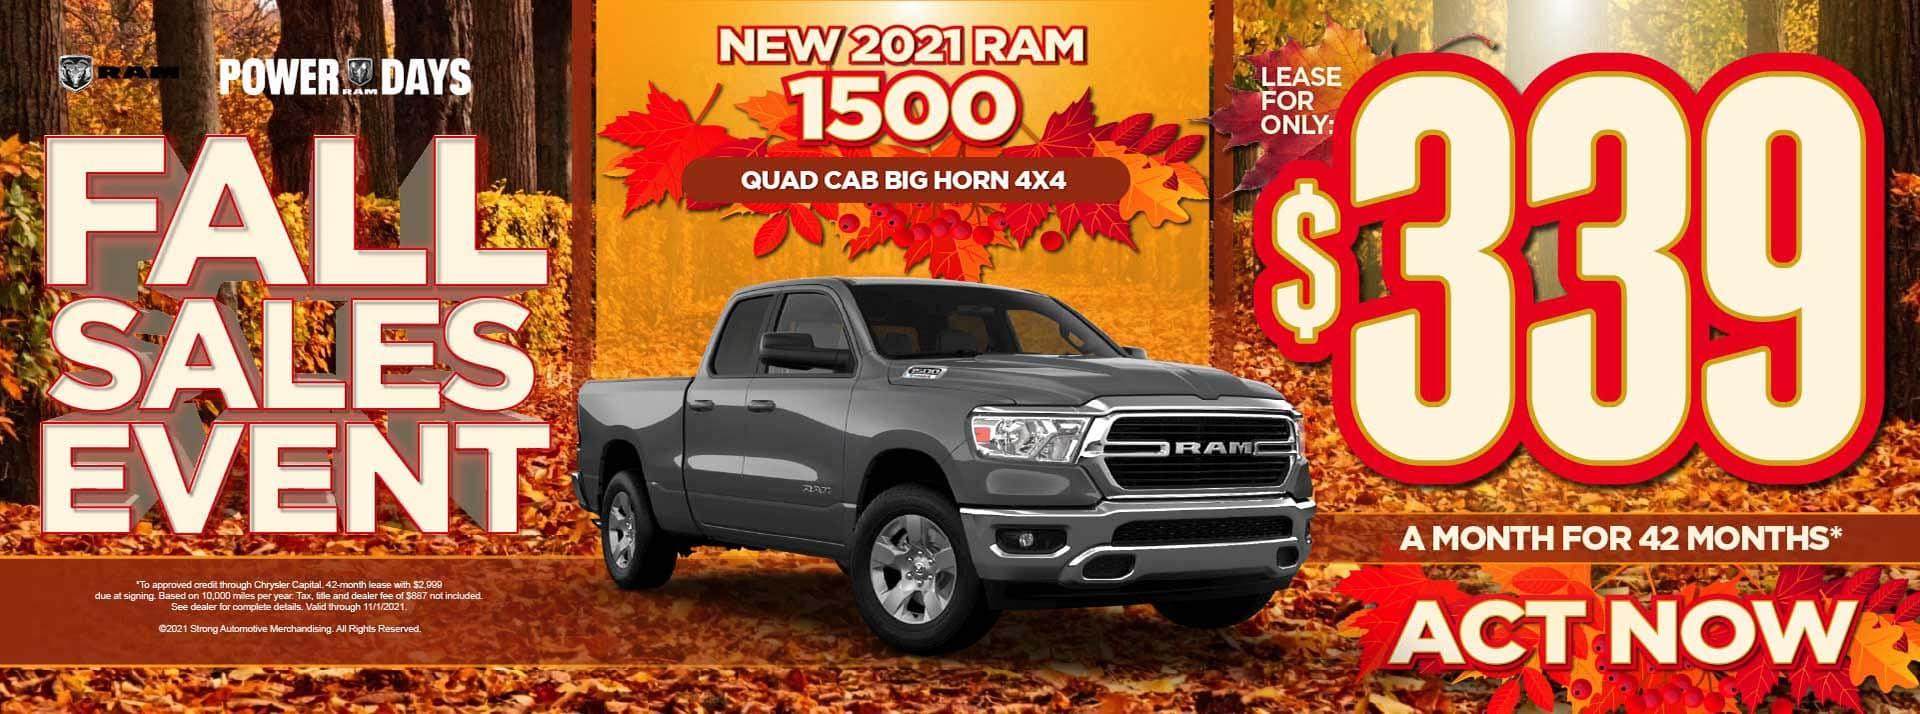 New 2021 Ram 1500 Quad Cab Big Horn 4x4 – $339 / mo - ACT NOW